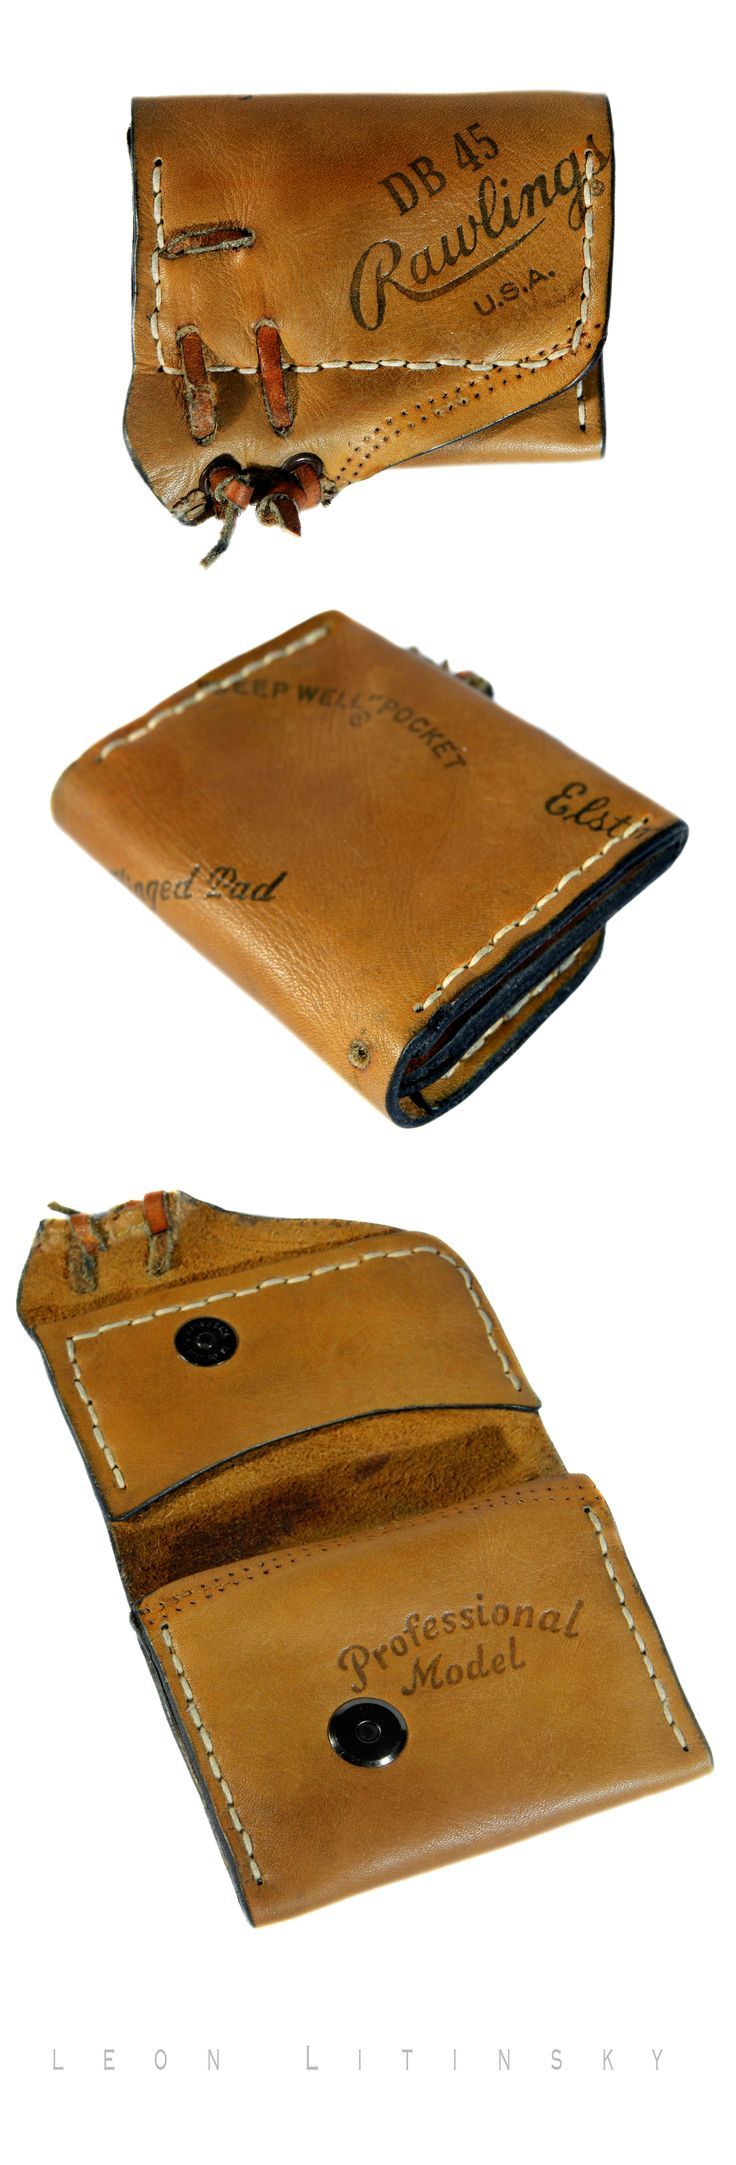 Recycled baseball glove wallet - Baseball Glove Transformation By Leon Litinsky